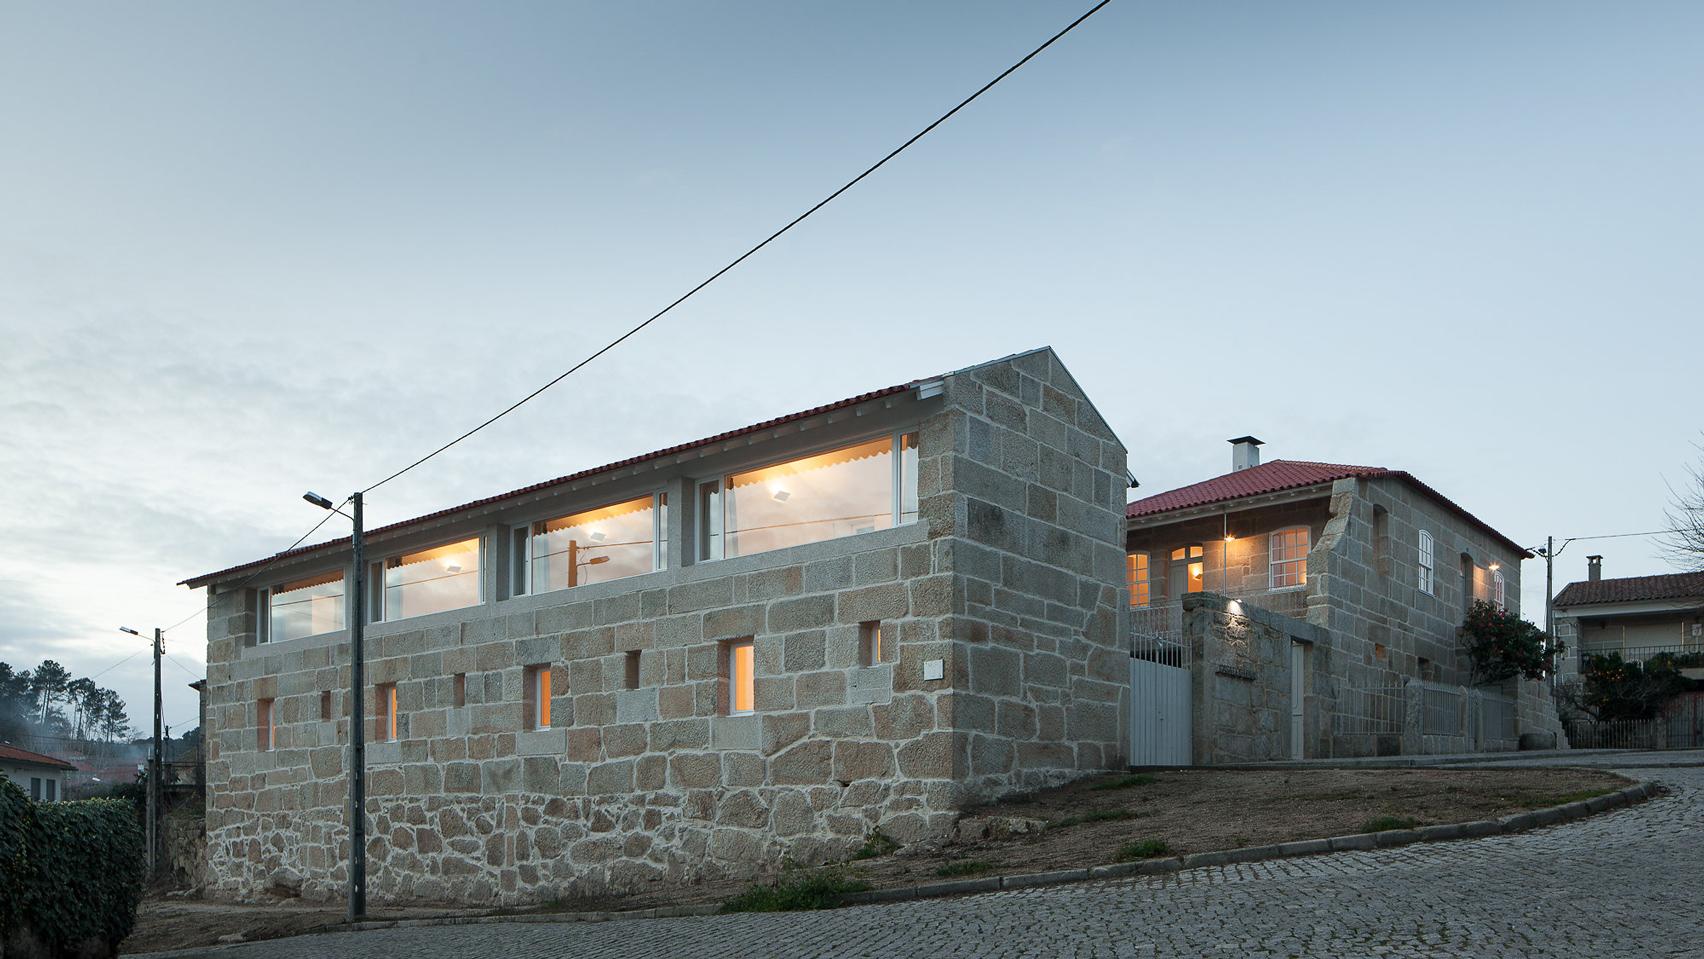 Feitais House by José Lobo Almeida